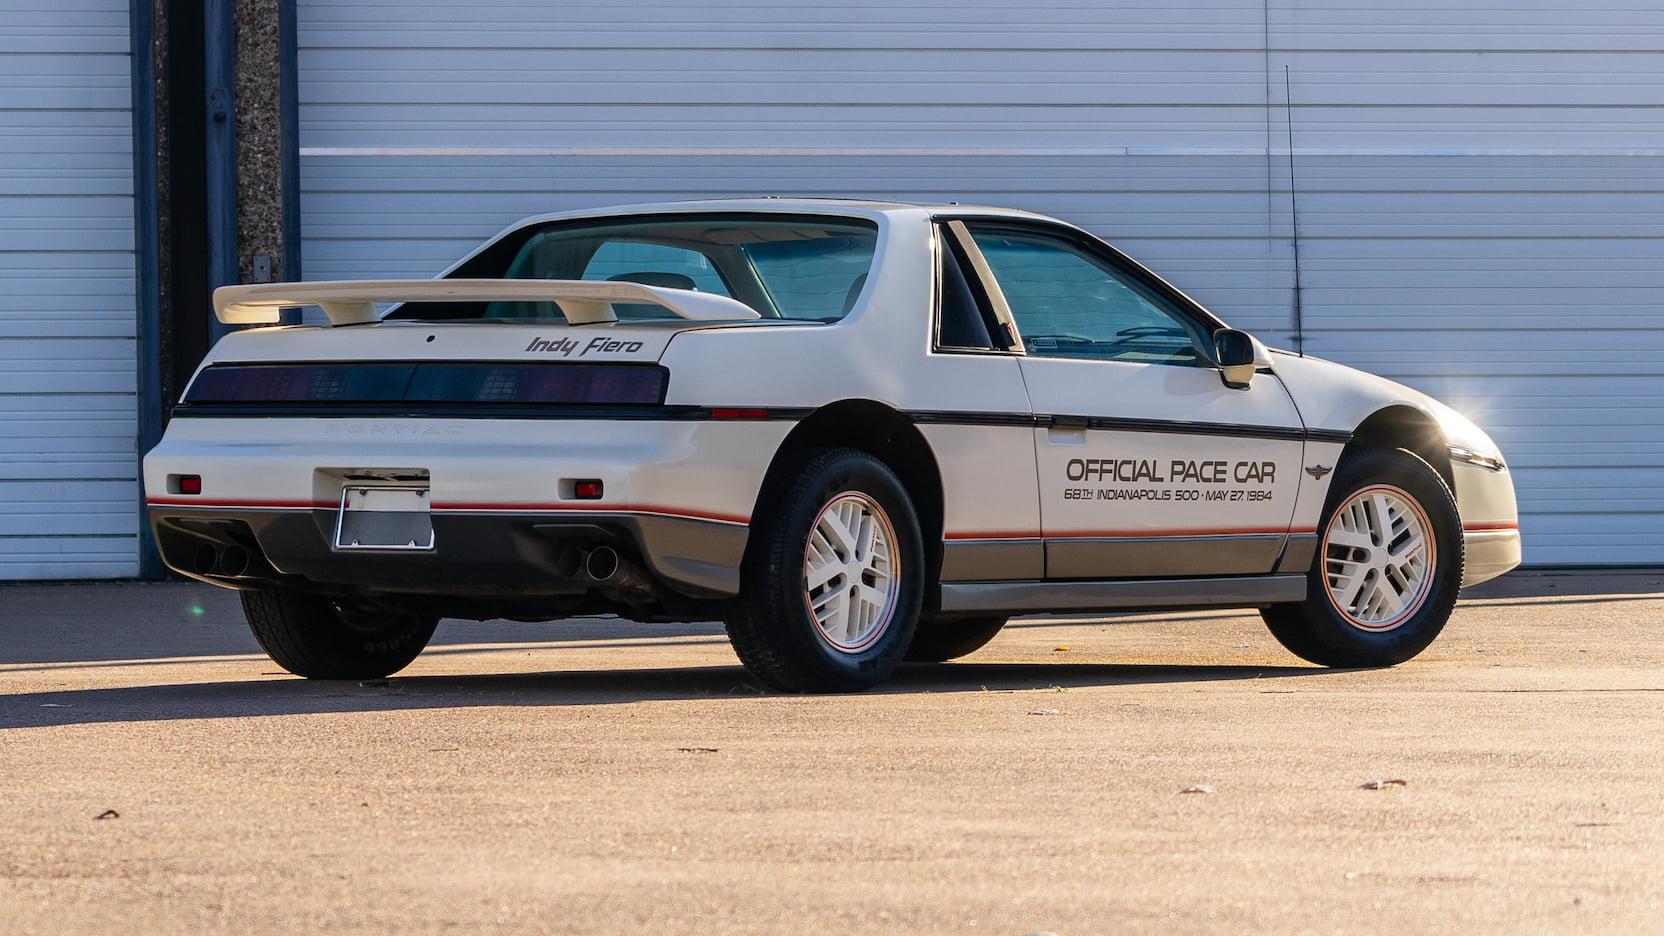 1984 Pontiac Fiero Indy Pace Car Rear Three-Quarter